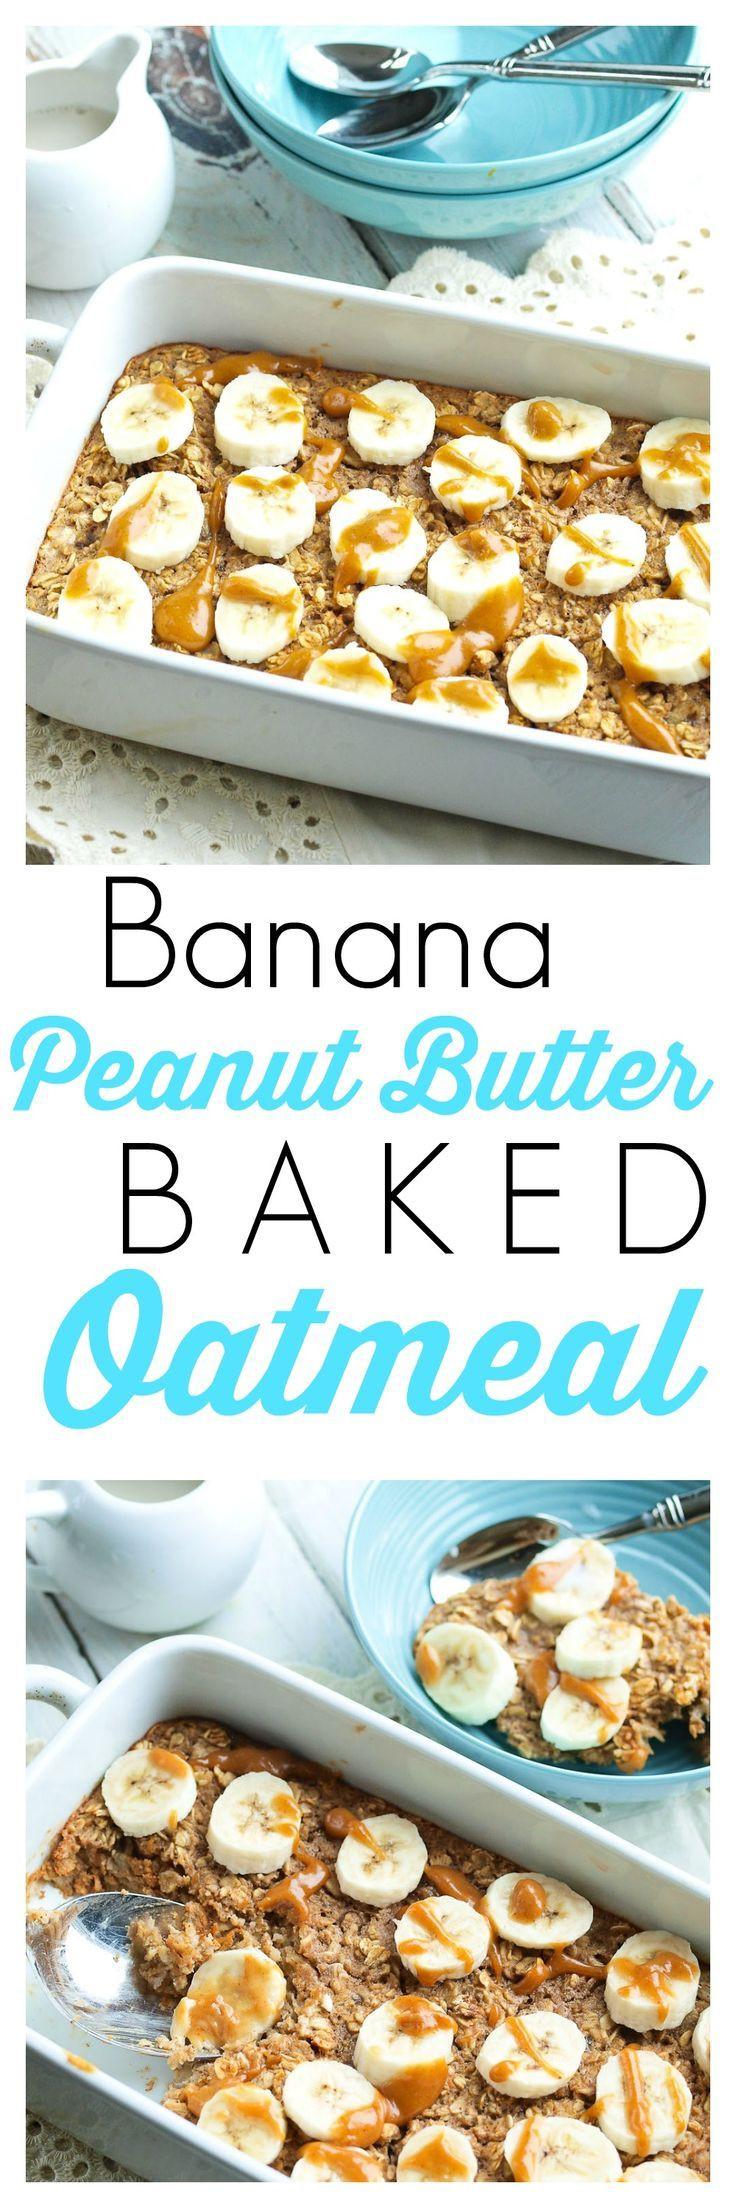 Healthy Breakfast Baked Goods  Good & Healthy Breakfasts Banana Peanut Butter Baked